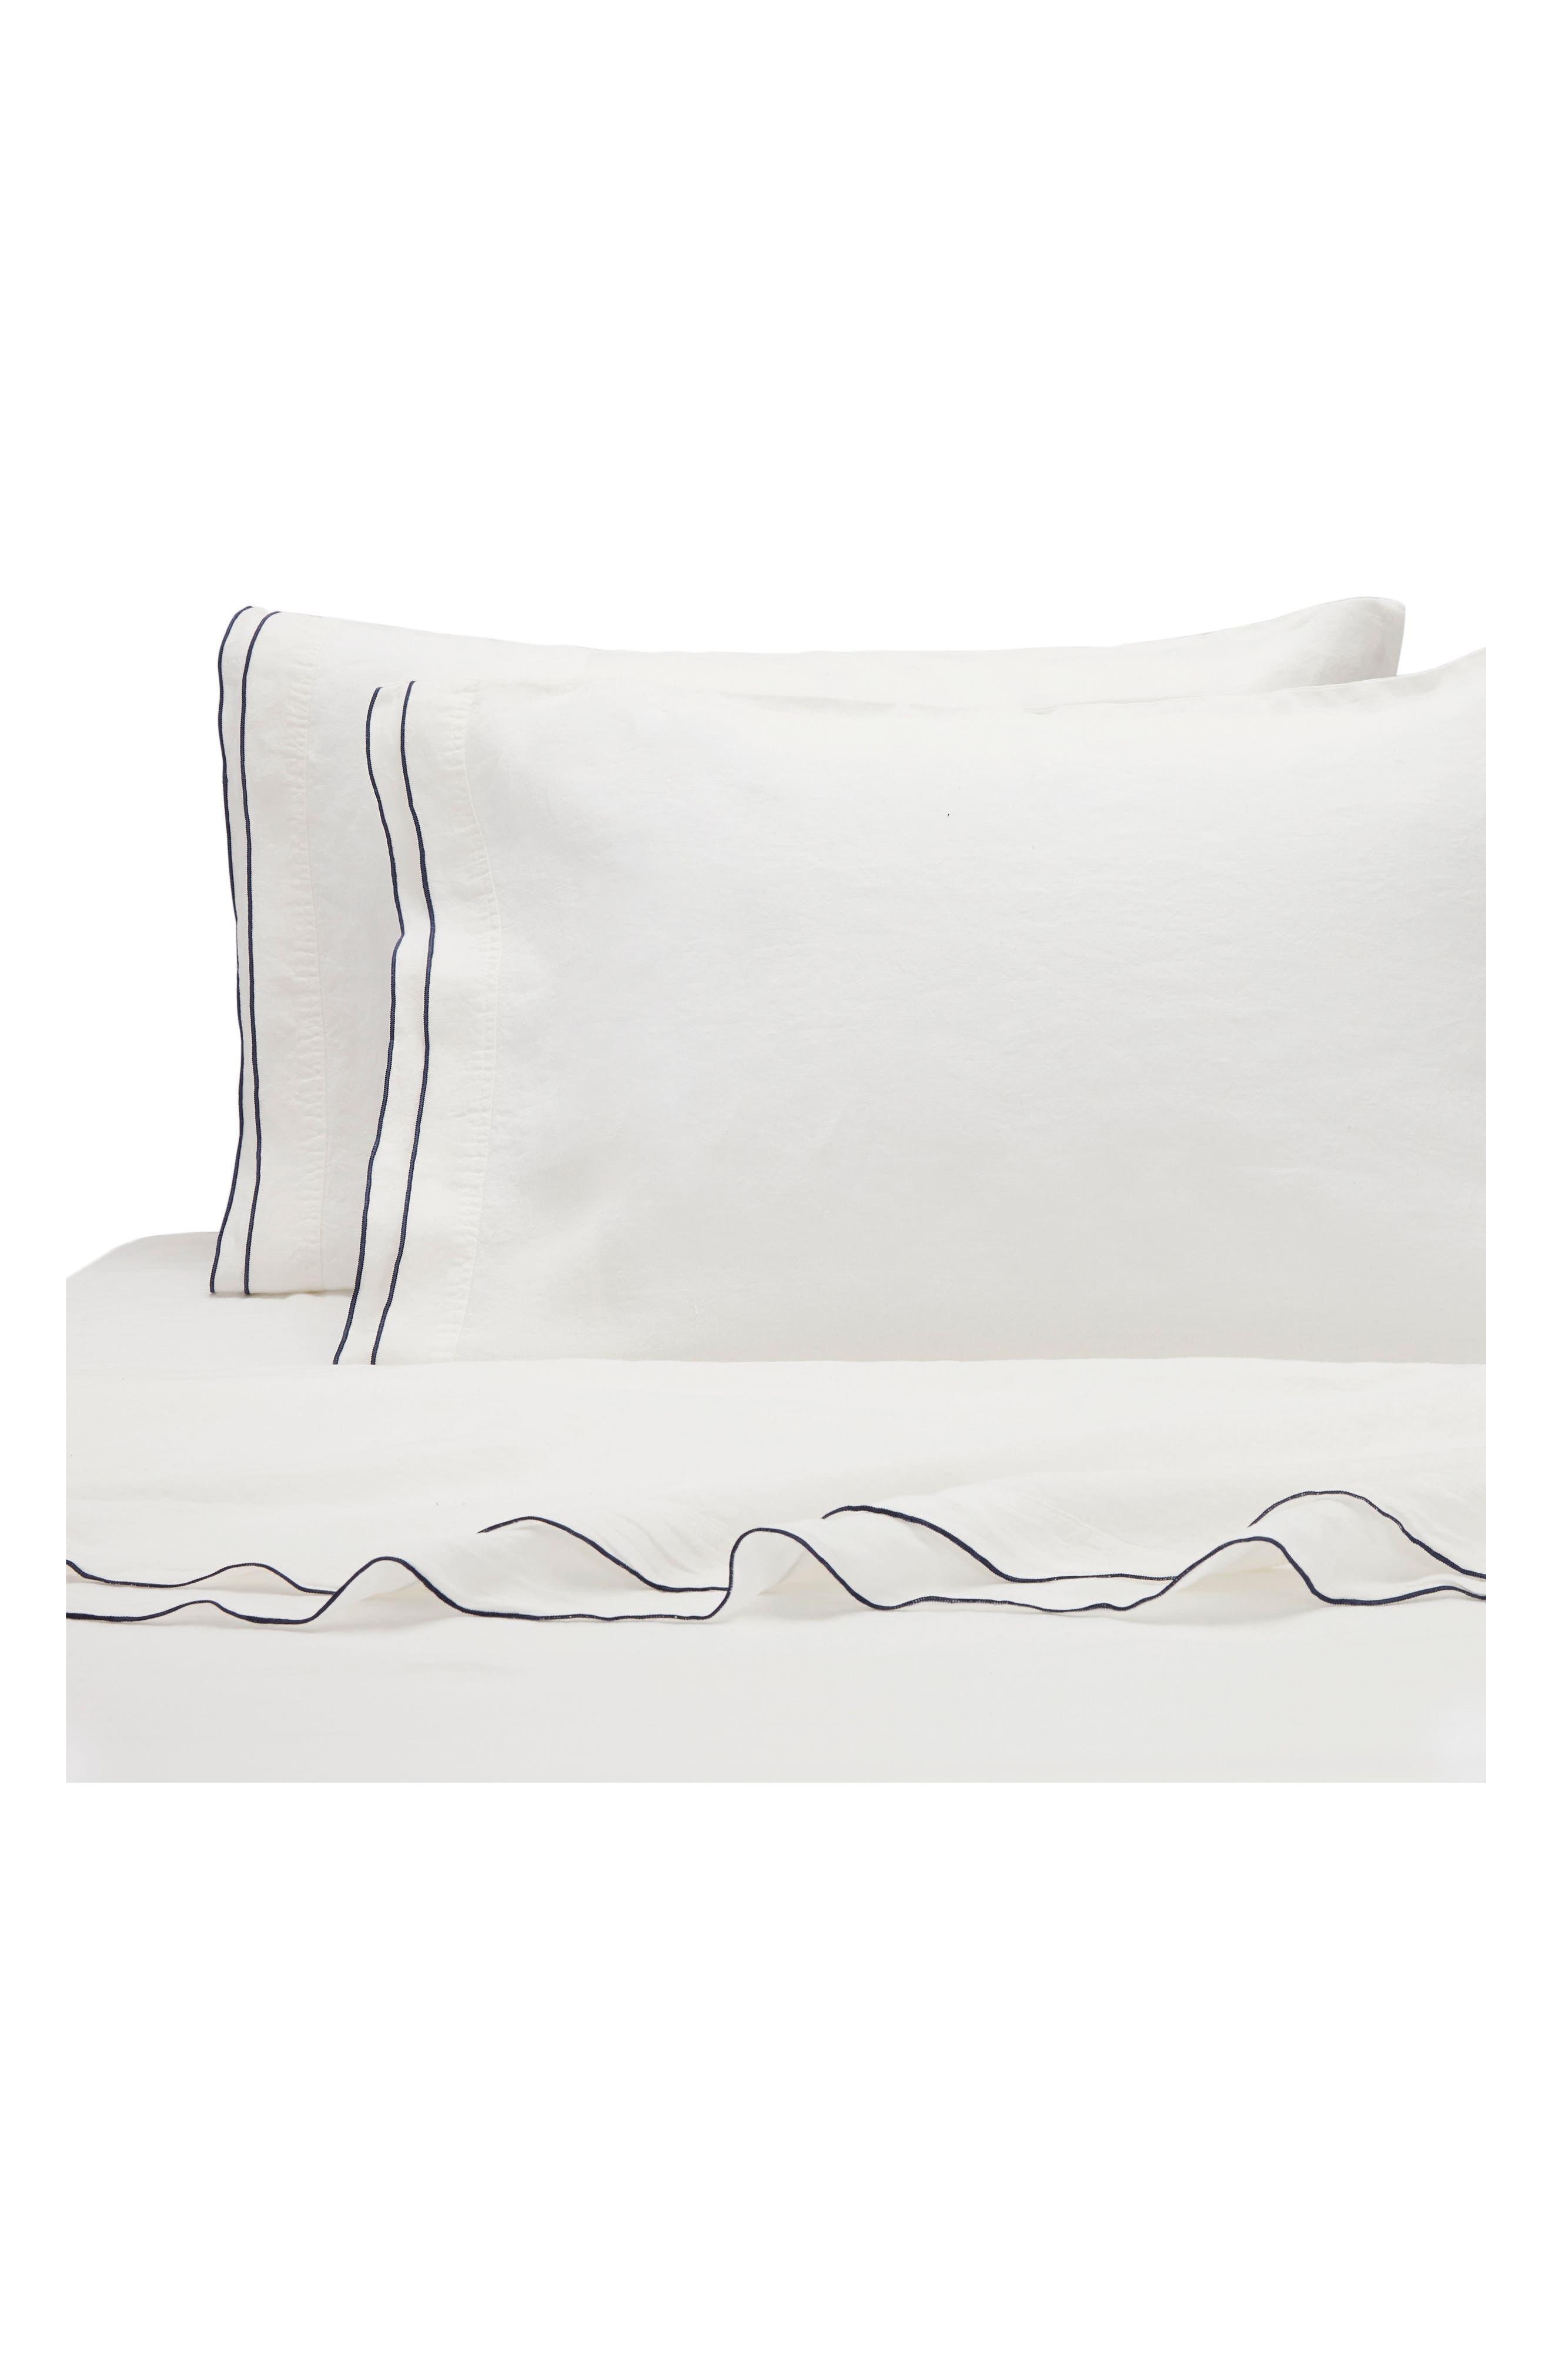 Main Image - KASSATEX Biarritz Linen 300 Thread Count Pillowcase